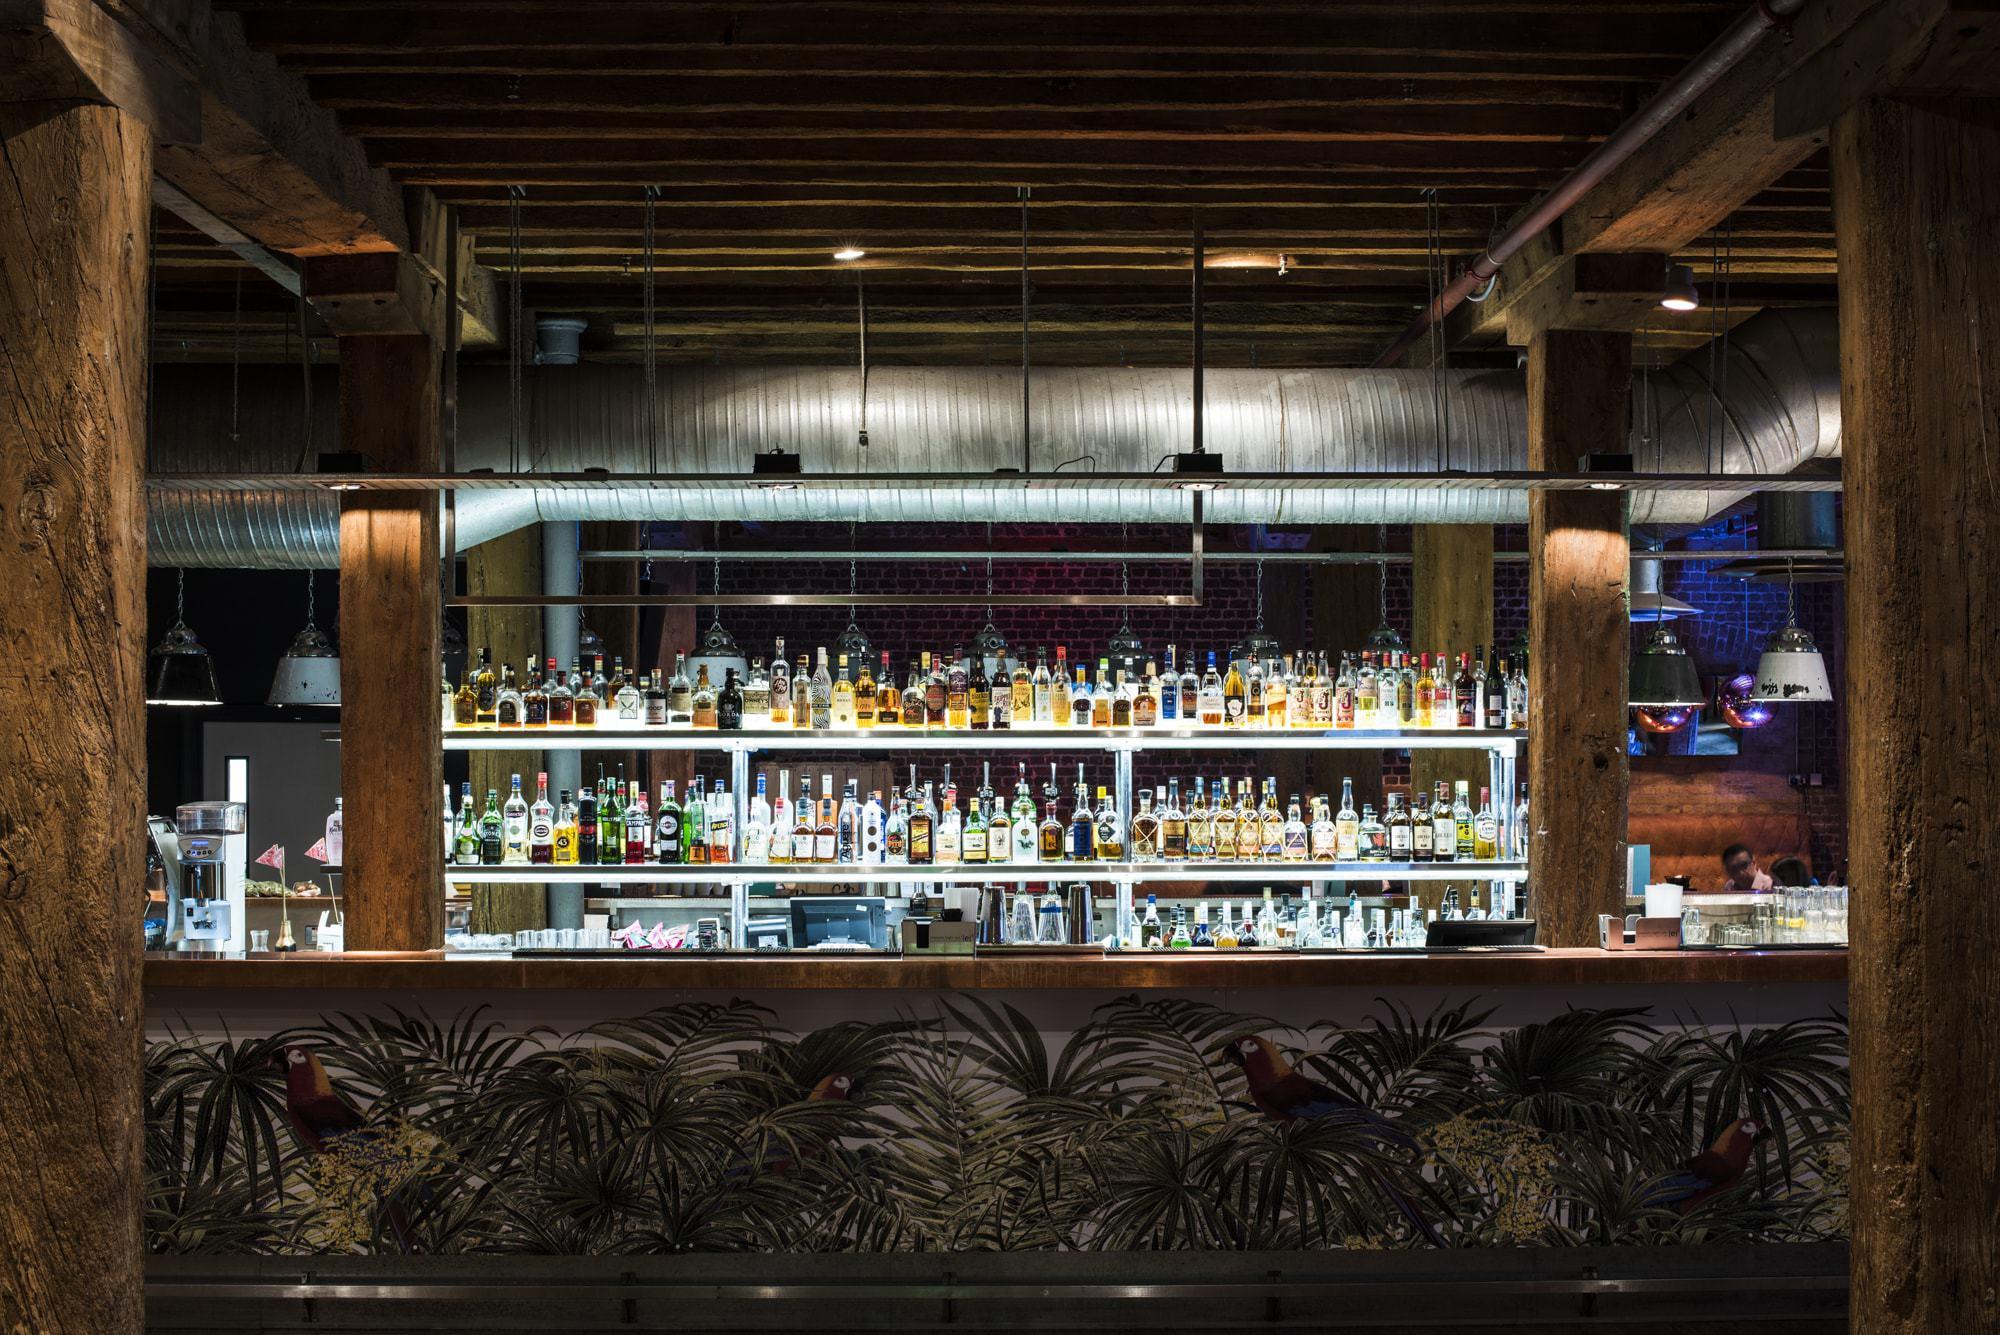 rum u0026 sugar cocktail bar u0026 bar west india quay canary wharf